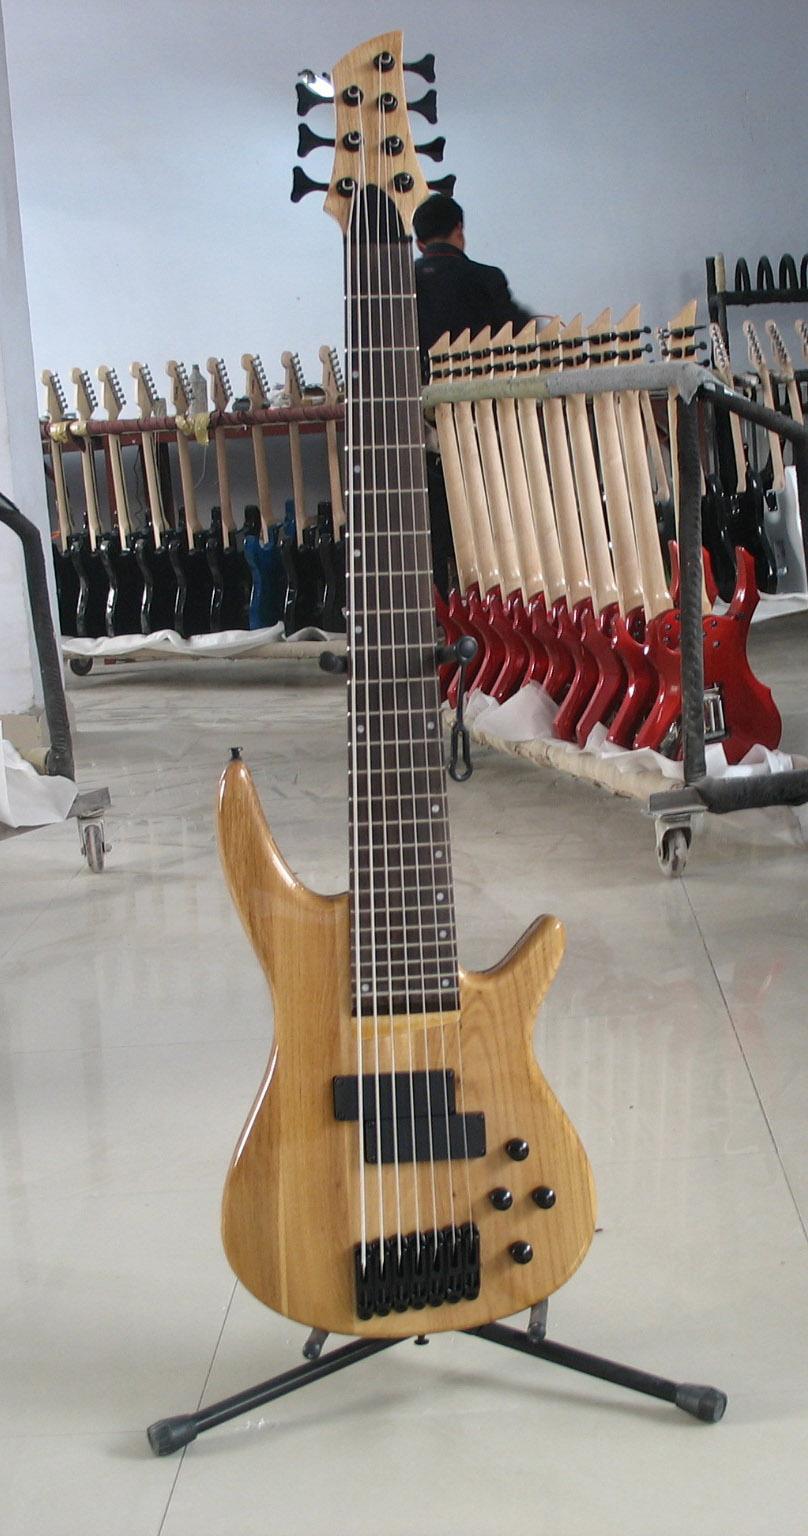 2020 Jingying Music Custom 7 Strings Electric Guitars and Bass Guitar 4